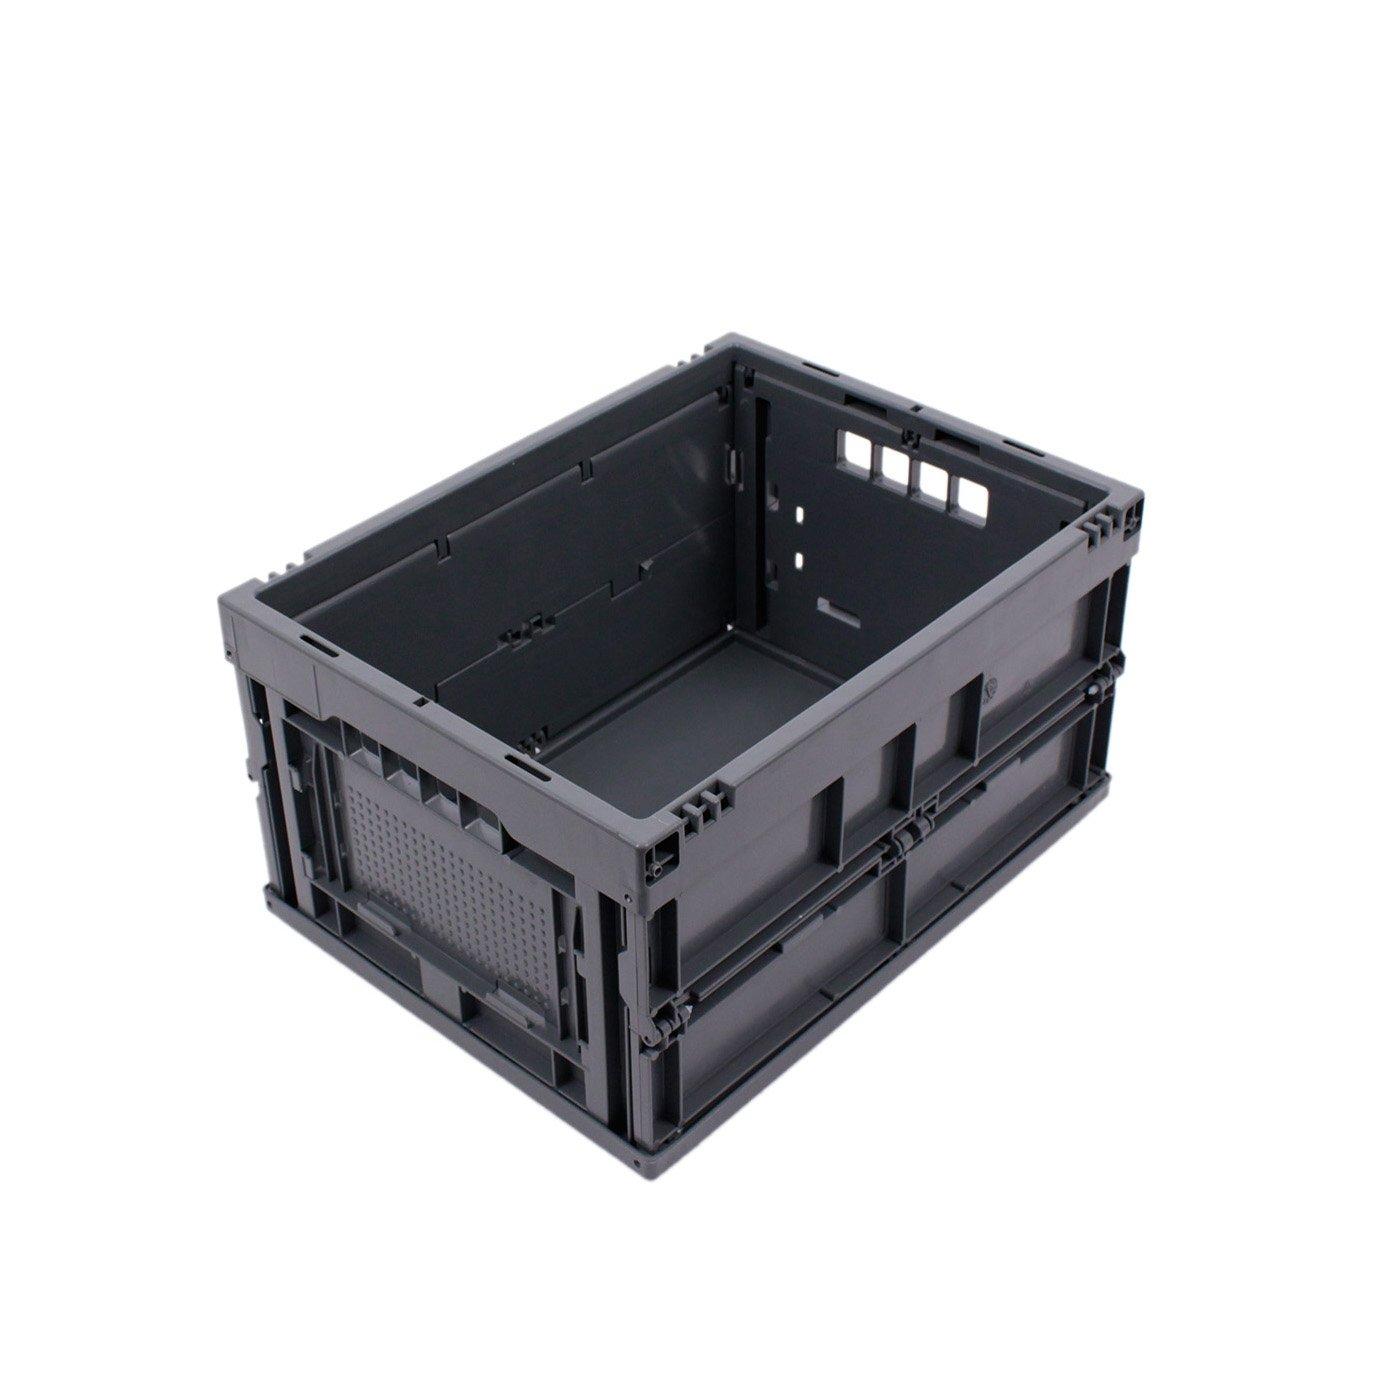 Plastikbox KLAPPBOX 20 LITER Blau Kunststoff Transportkiste max 25kg 40x30x22 cm stabile Faltbox Made in Germany Transportbox kleine